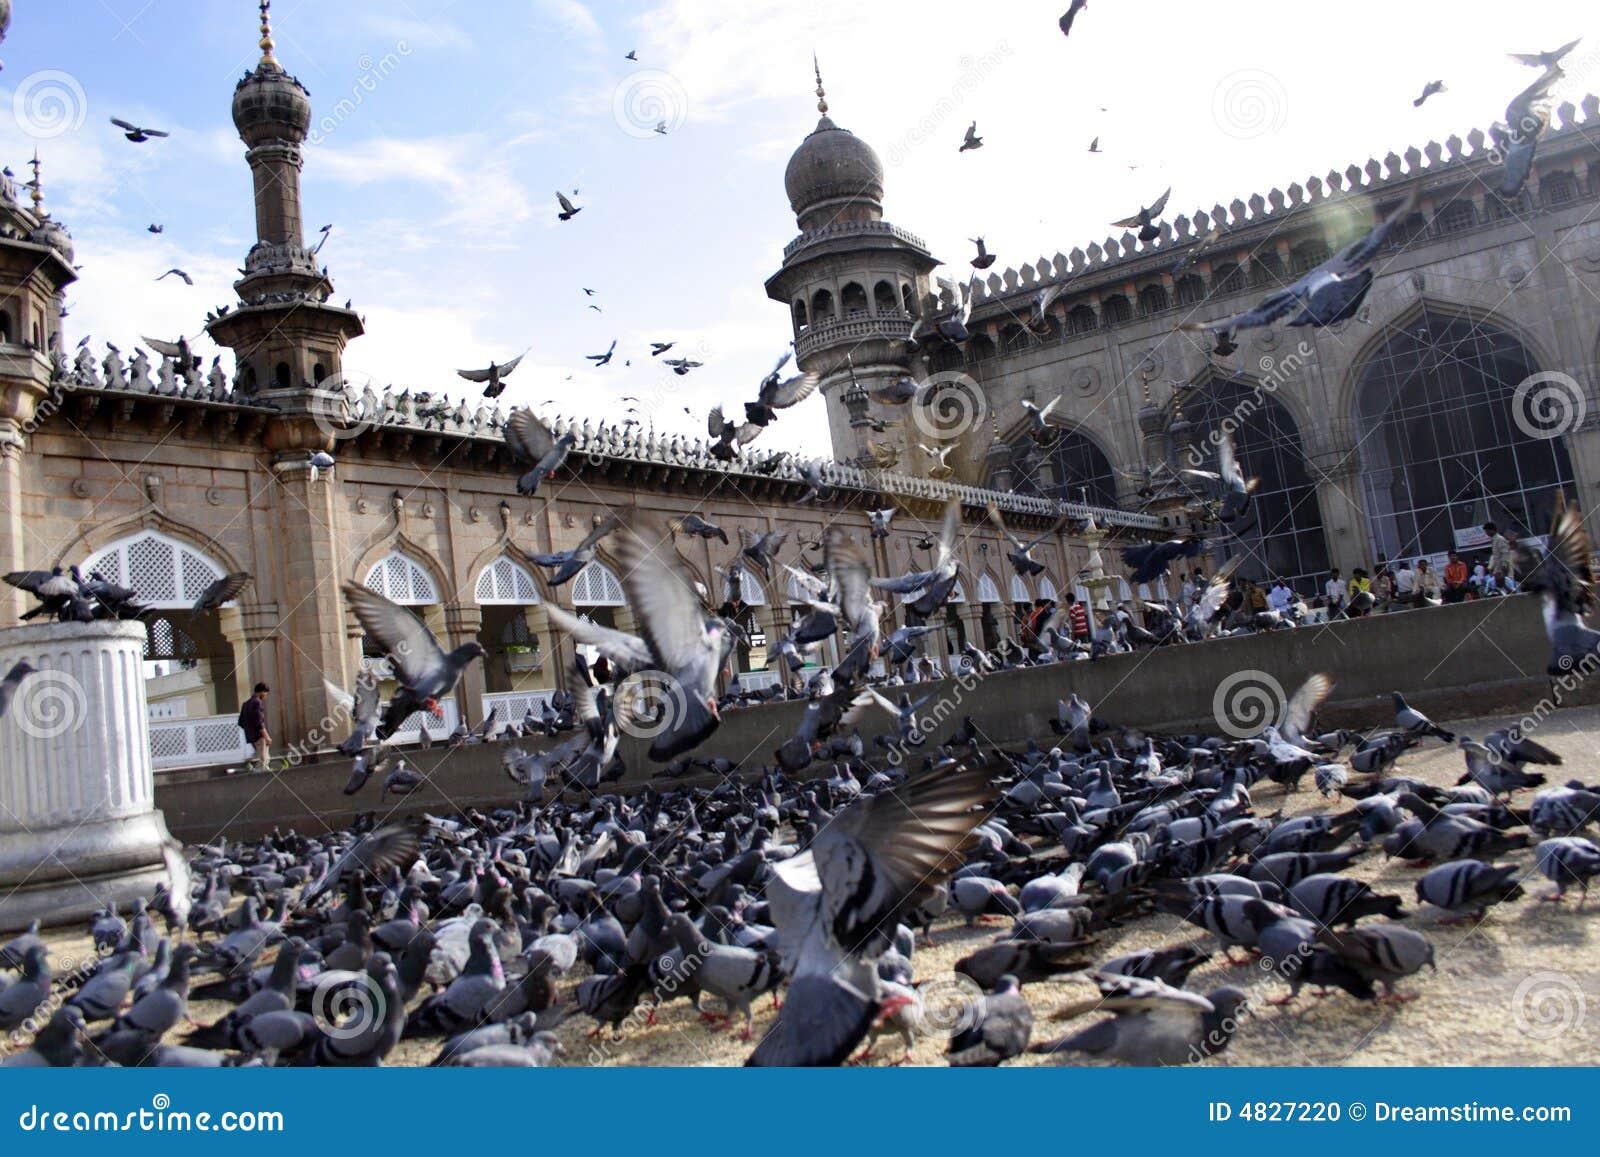 La Meca Masjid, Hyderabad